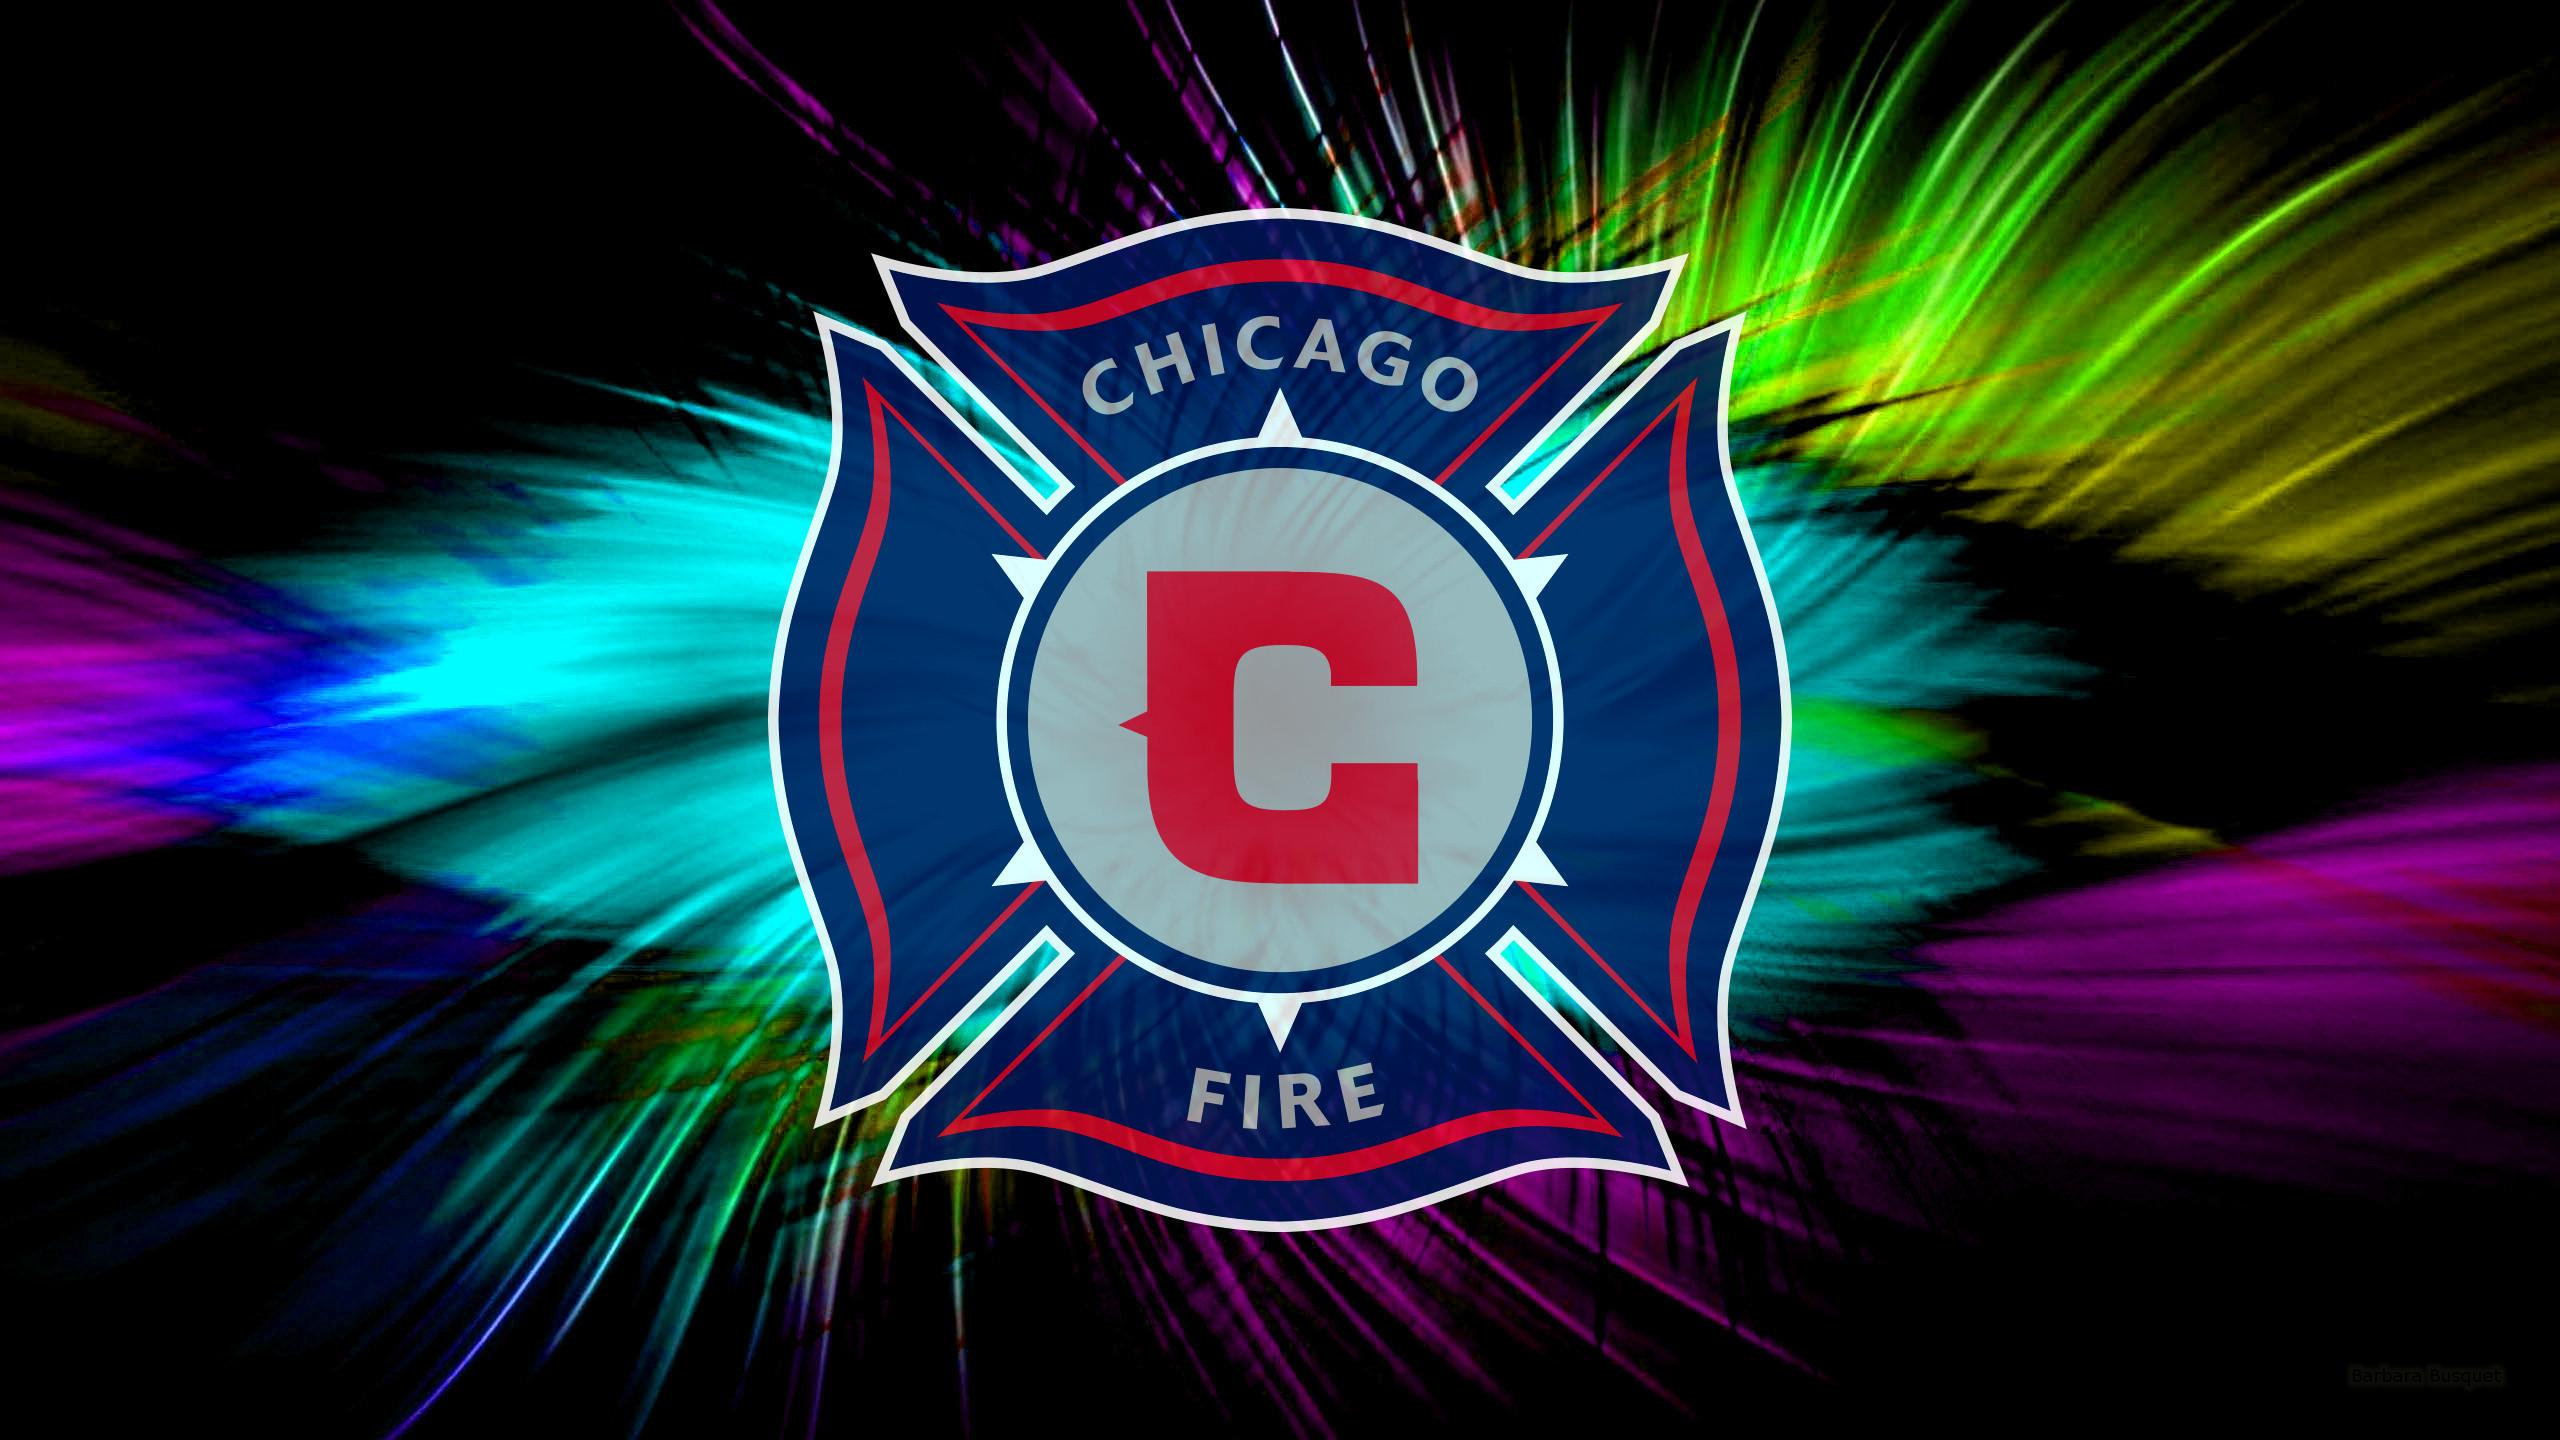 Chicago fire soccer club barbaras hd wallpapers abstract colorful wallpaper chicago fire biocorpaavc